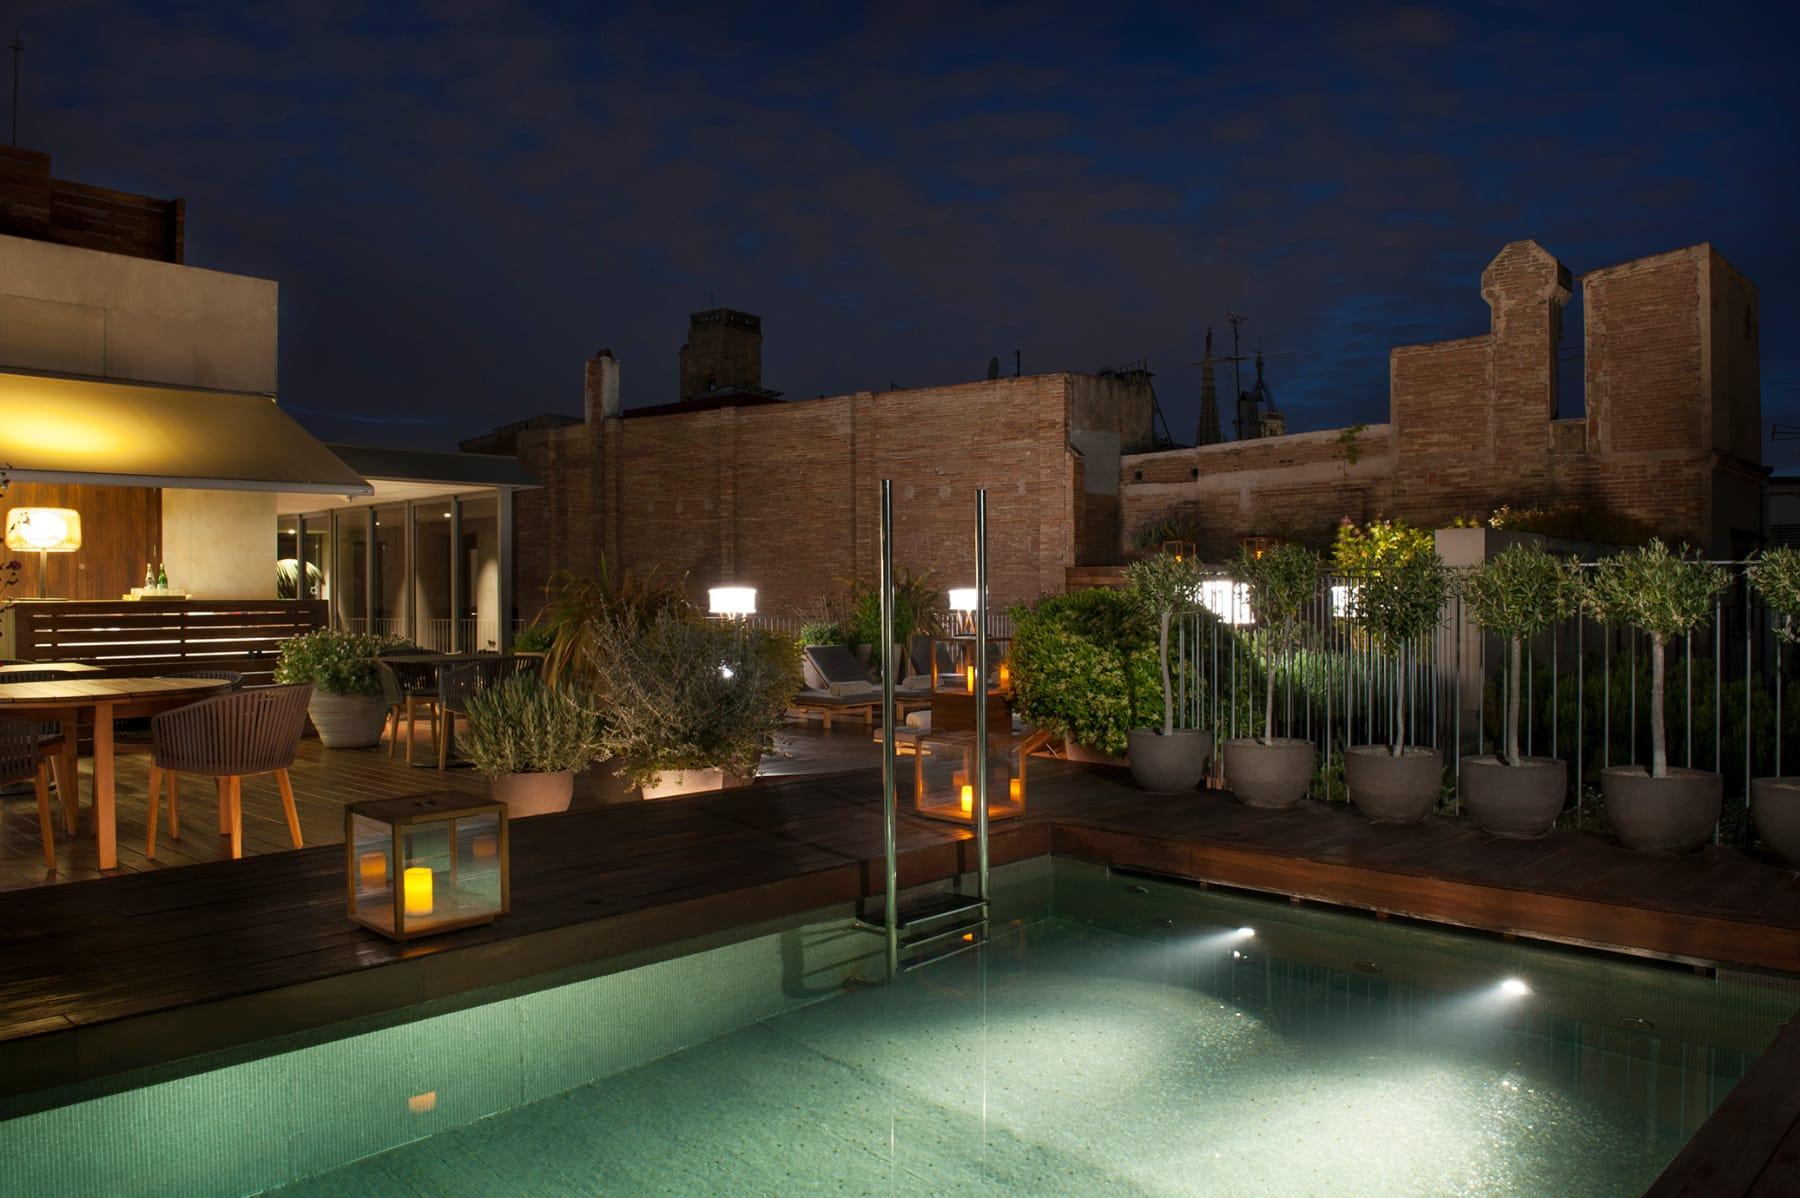 Terrasse h tel de luxe barcelone h tels 5 toiles barcelone mercer hoteles barcelona - Hotel piscina barcellona ...